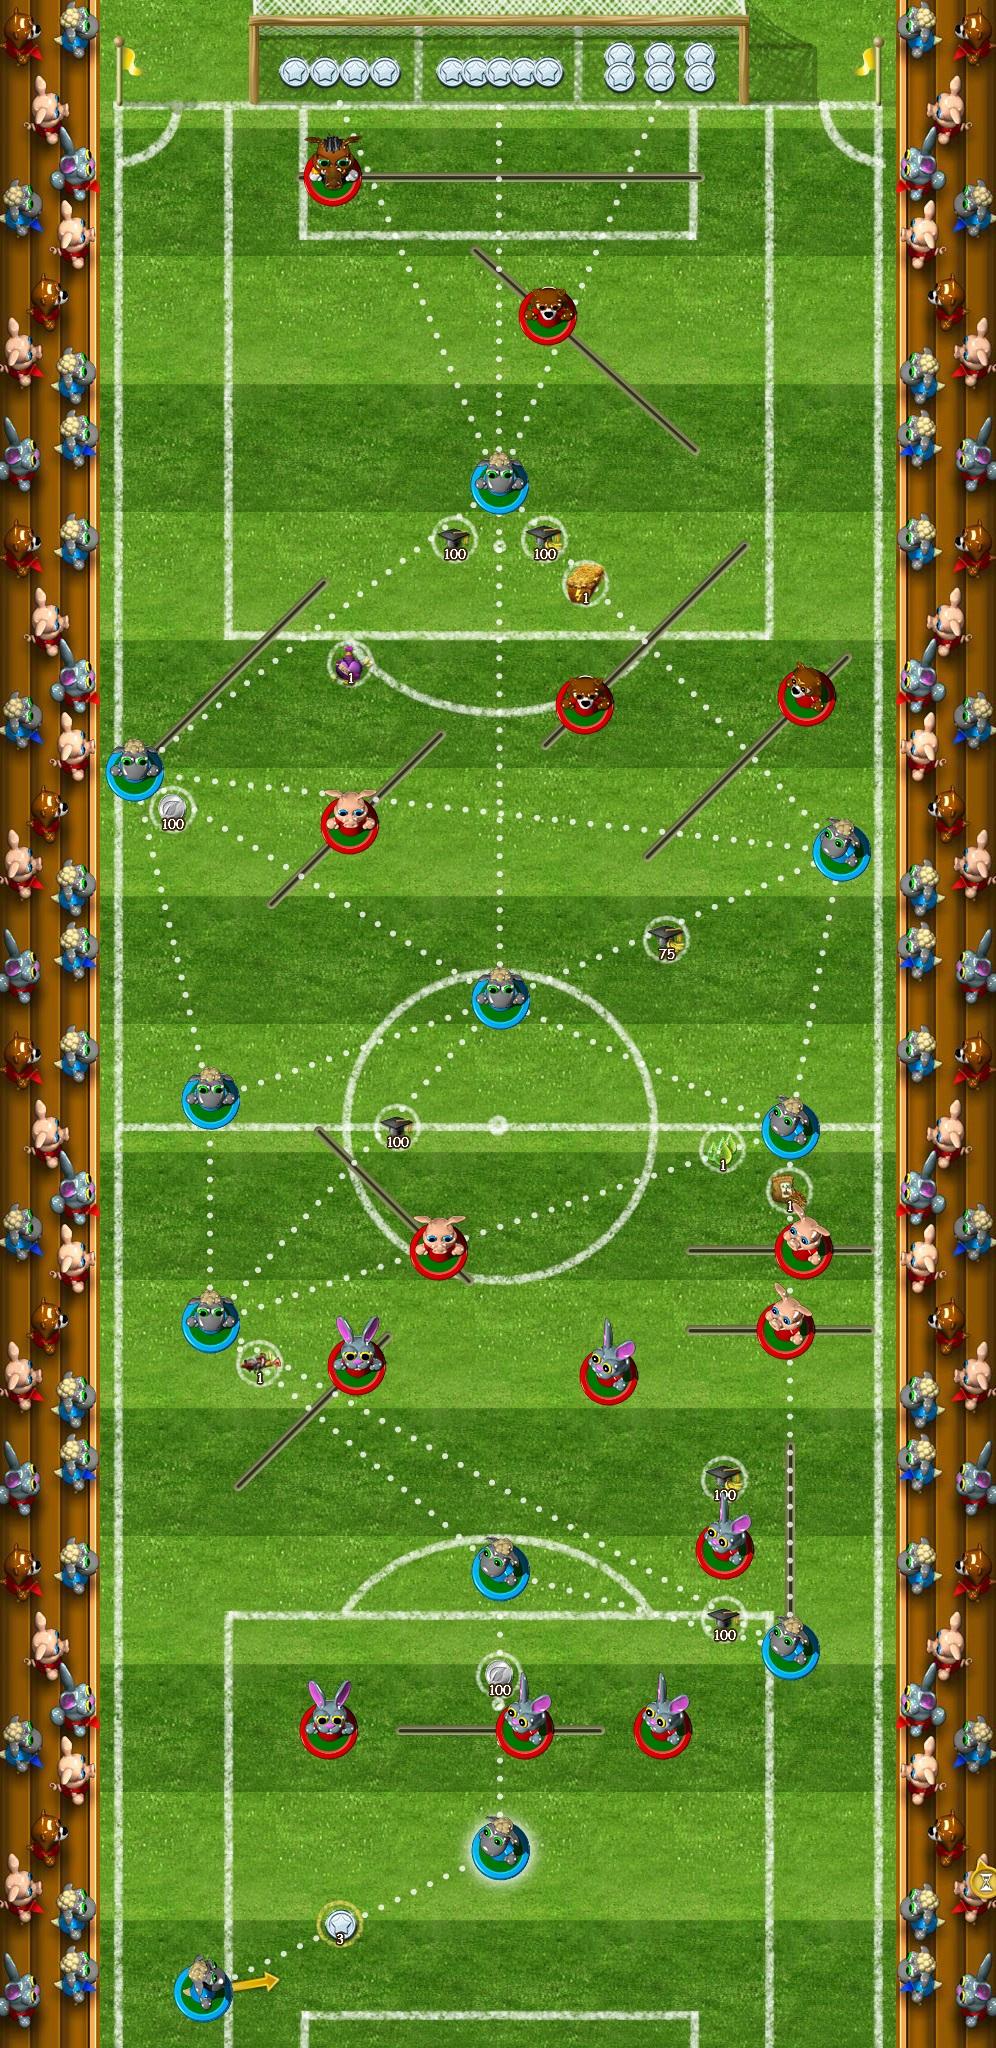 game0.jpg